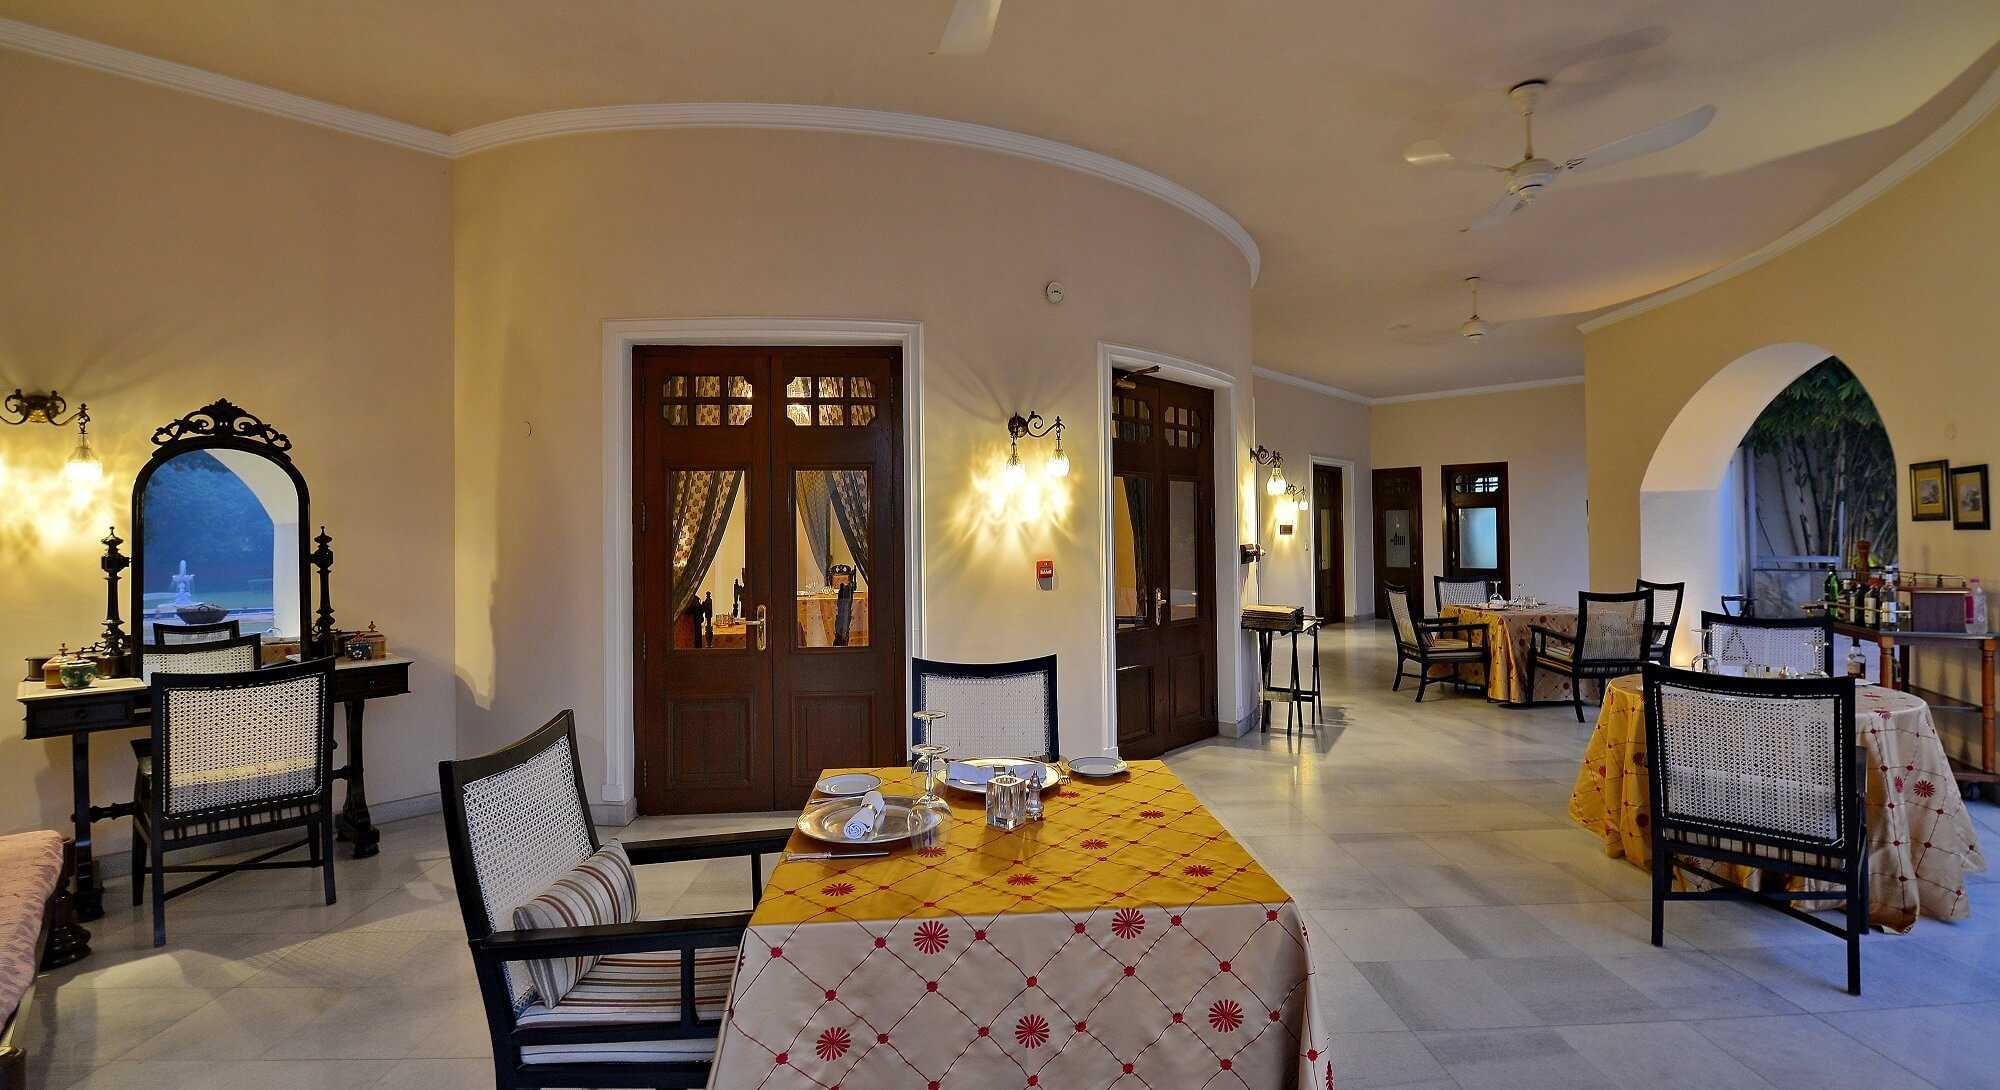 Taj Nadesar Palace Restaurant